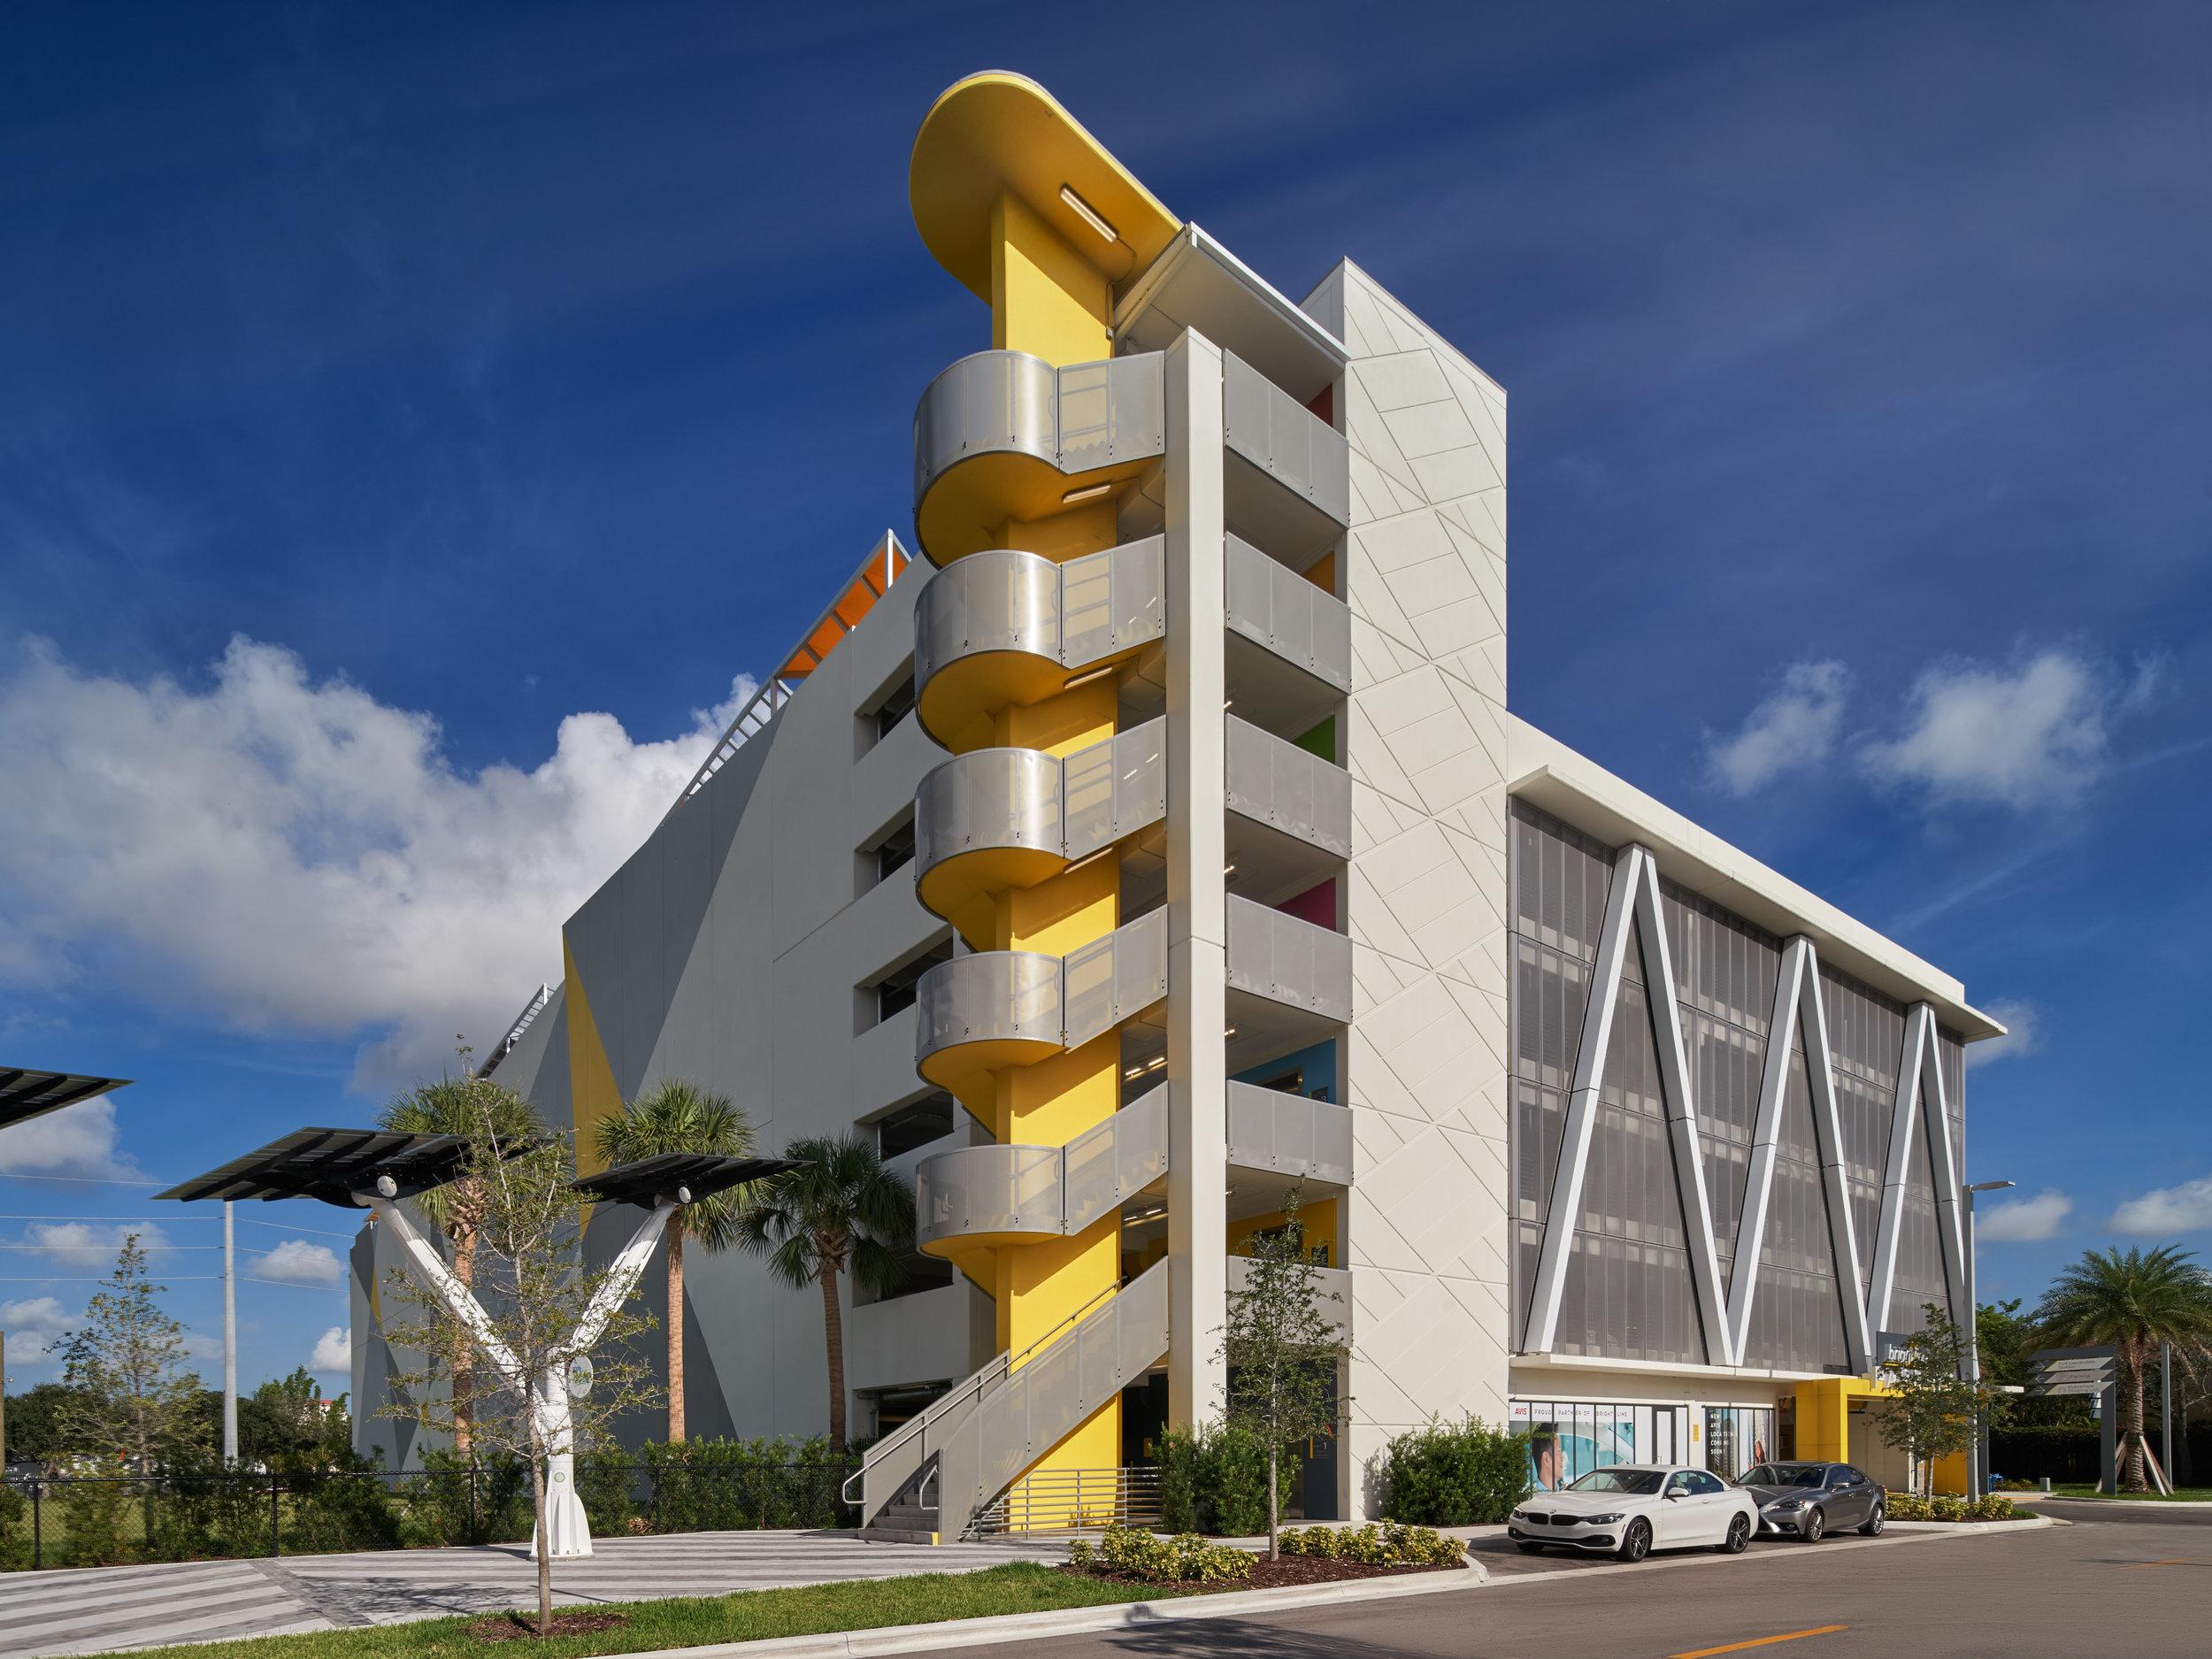 Ft. Lauderdale Garage tiff.jpg